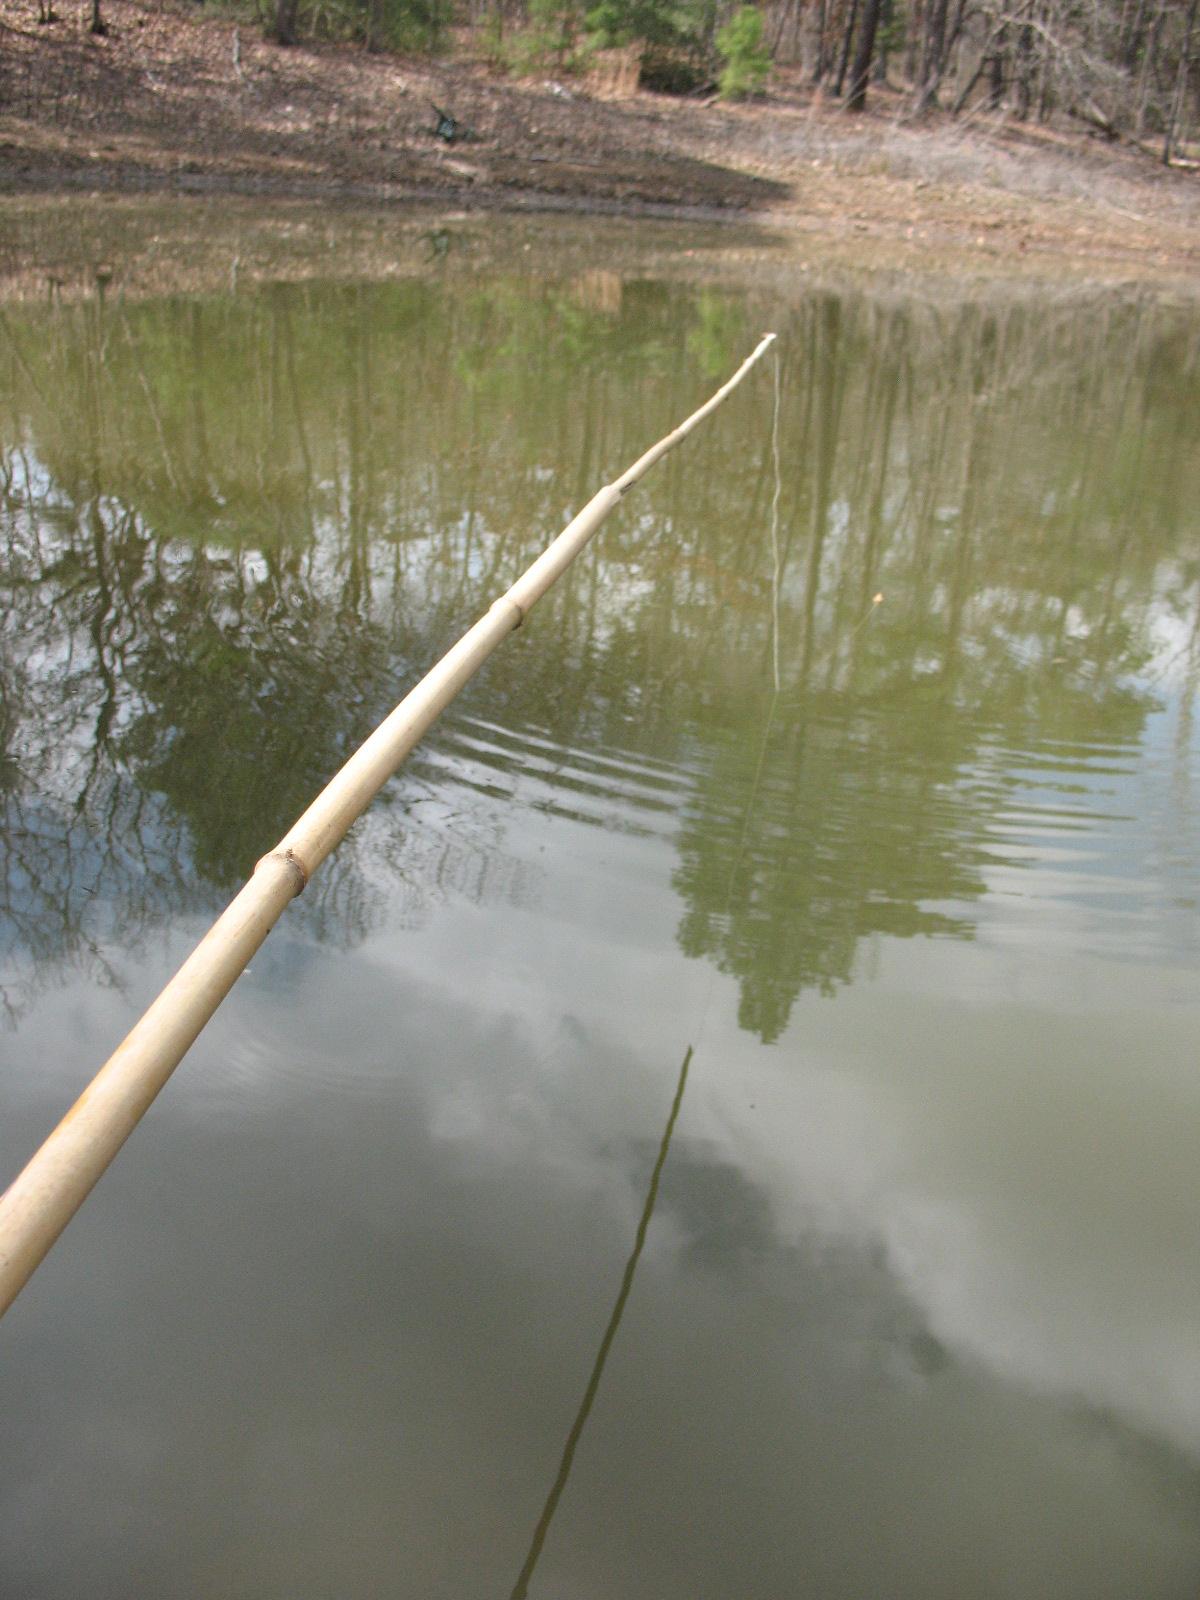 Primitive fishing catching fish sensible survival for Tiny fishing pole